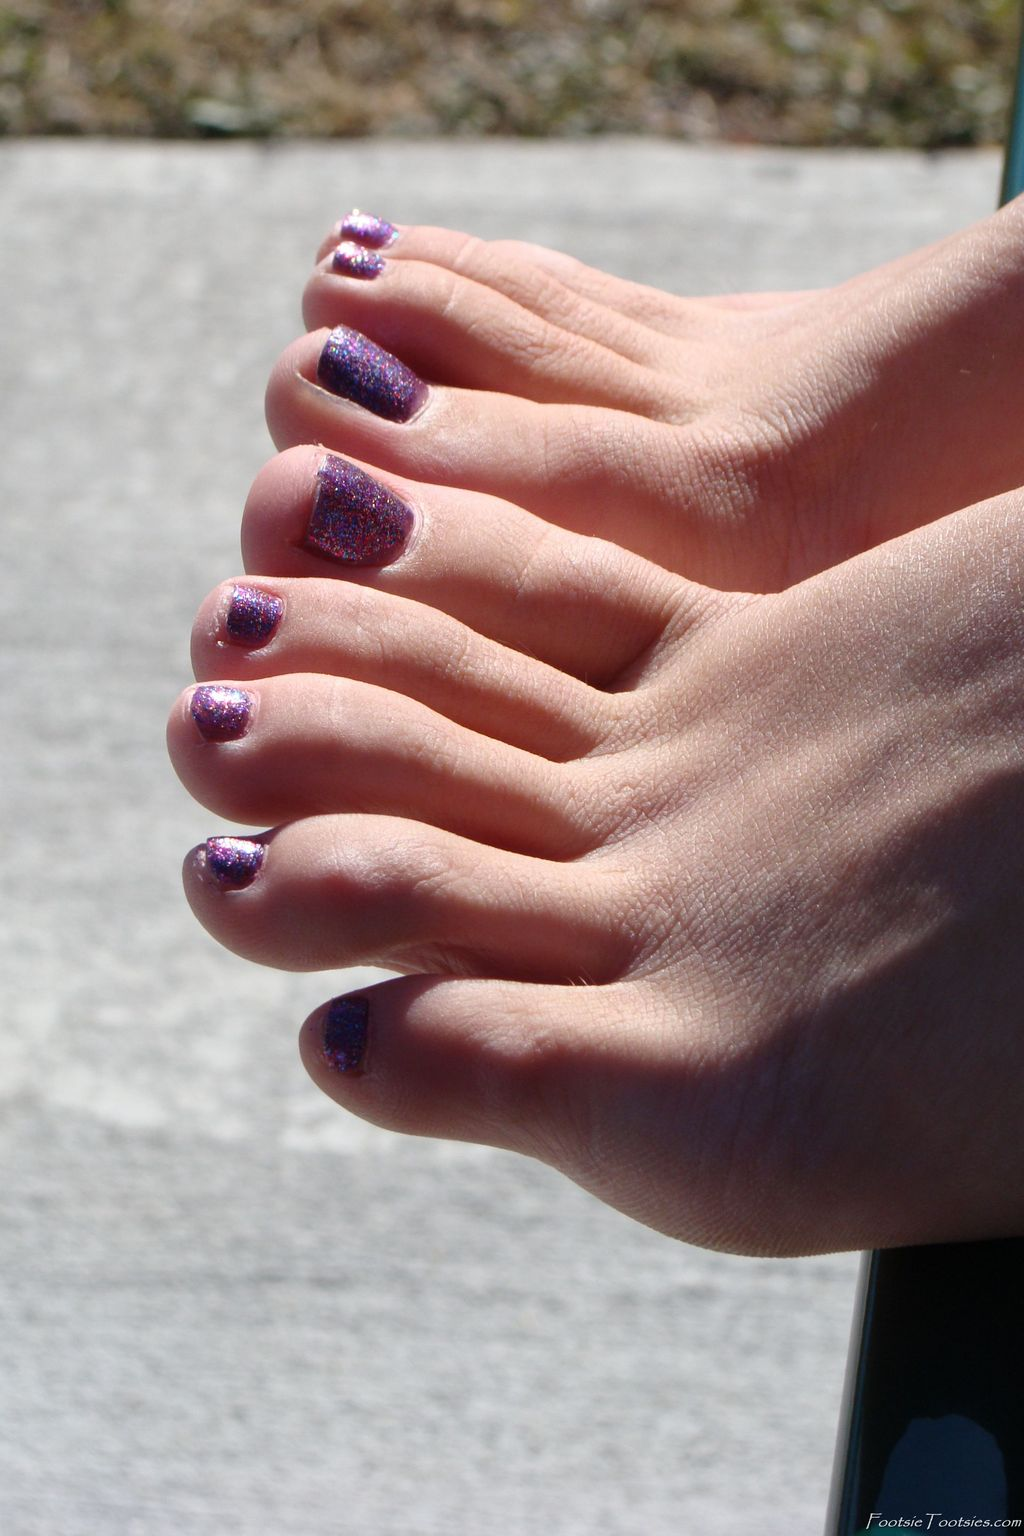 Wus Feet Links - California Foot Exchange